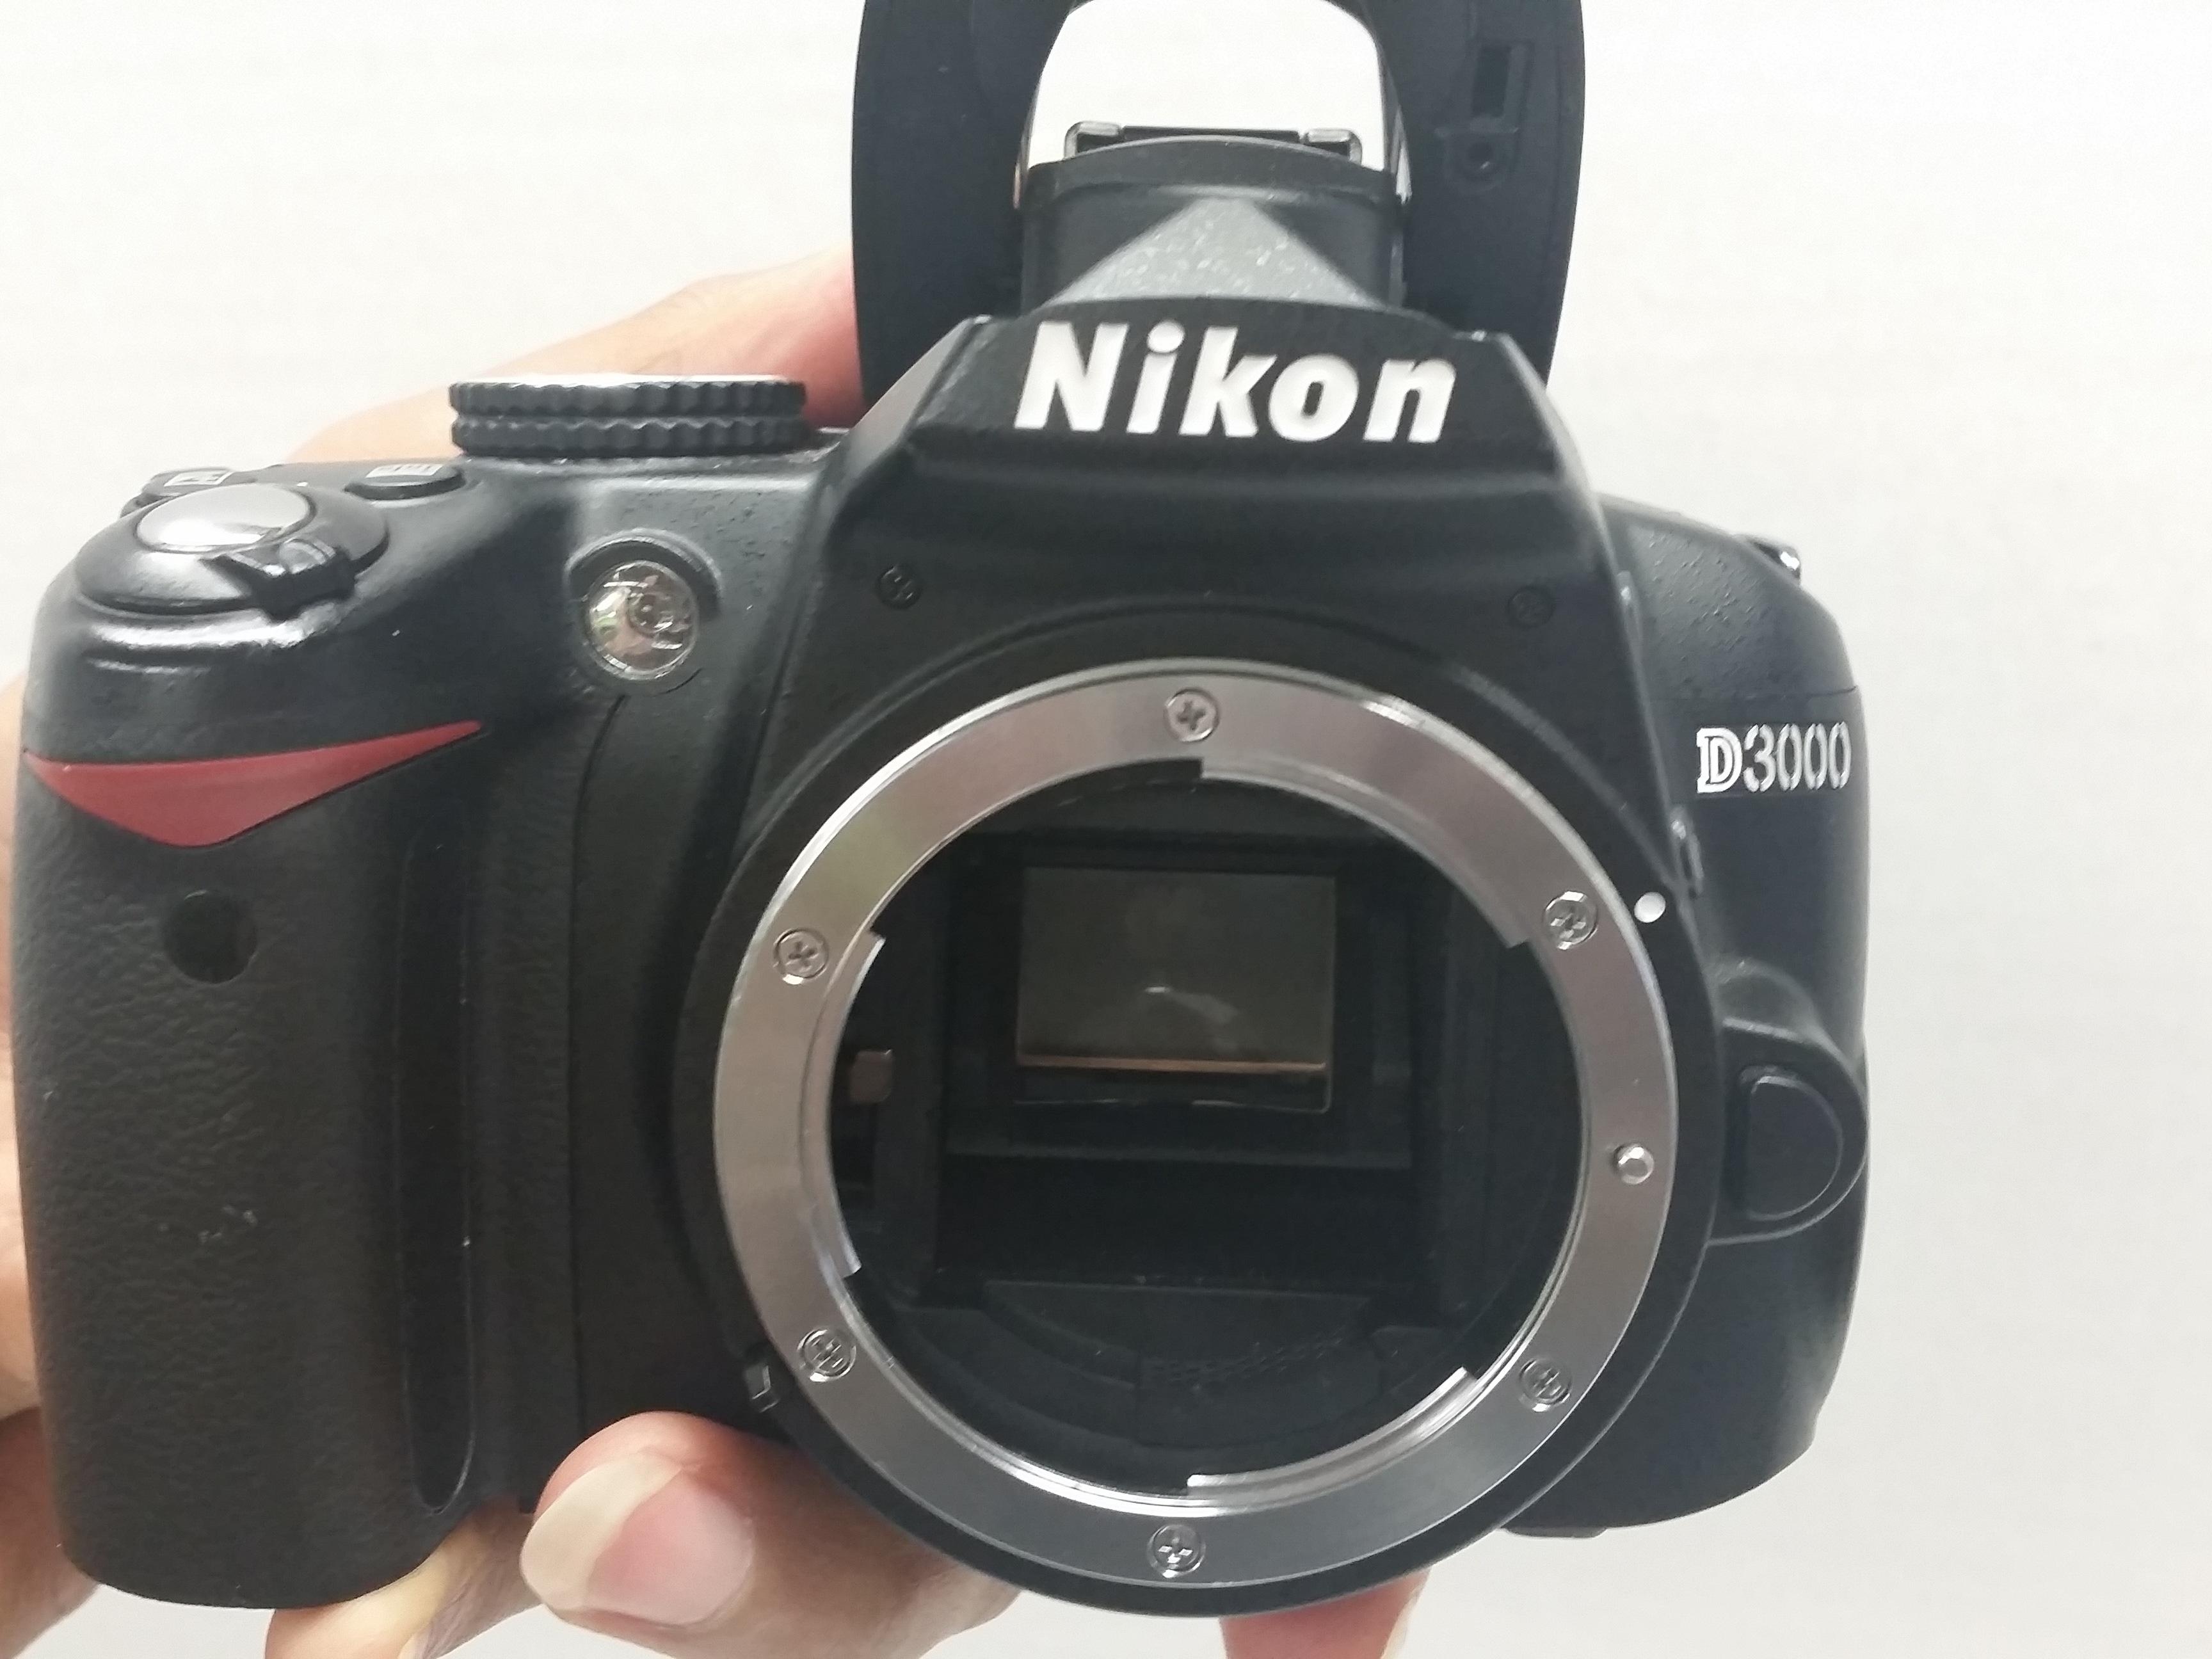 nikon d3000 ifixit rh ifixit com nikon d3000 user manual free download nikon d3000 user manual printable